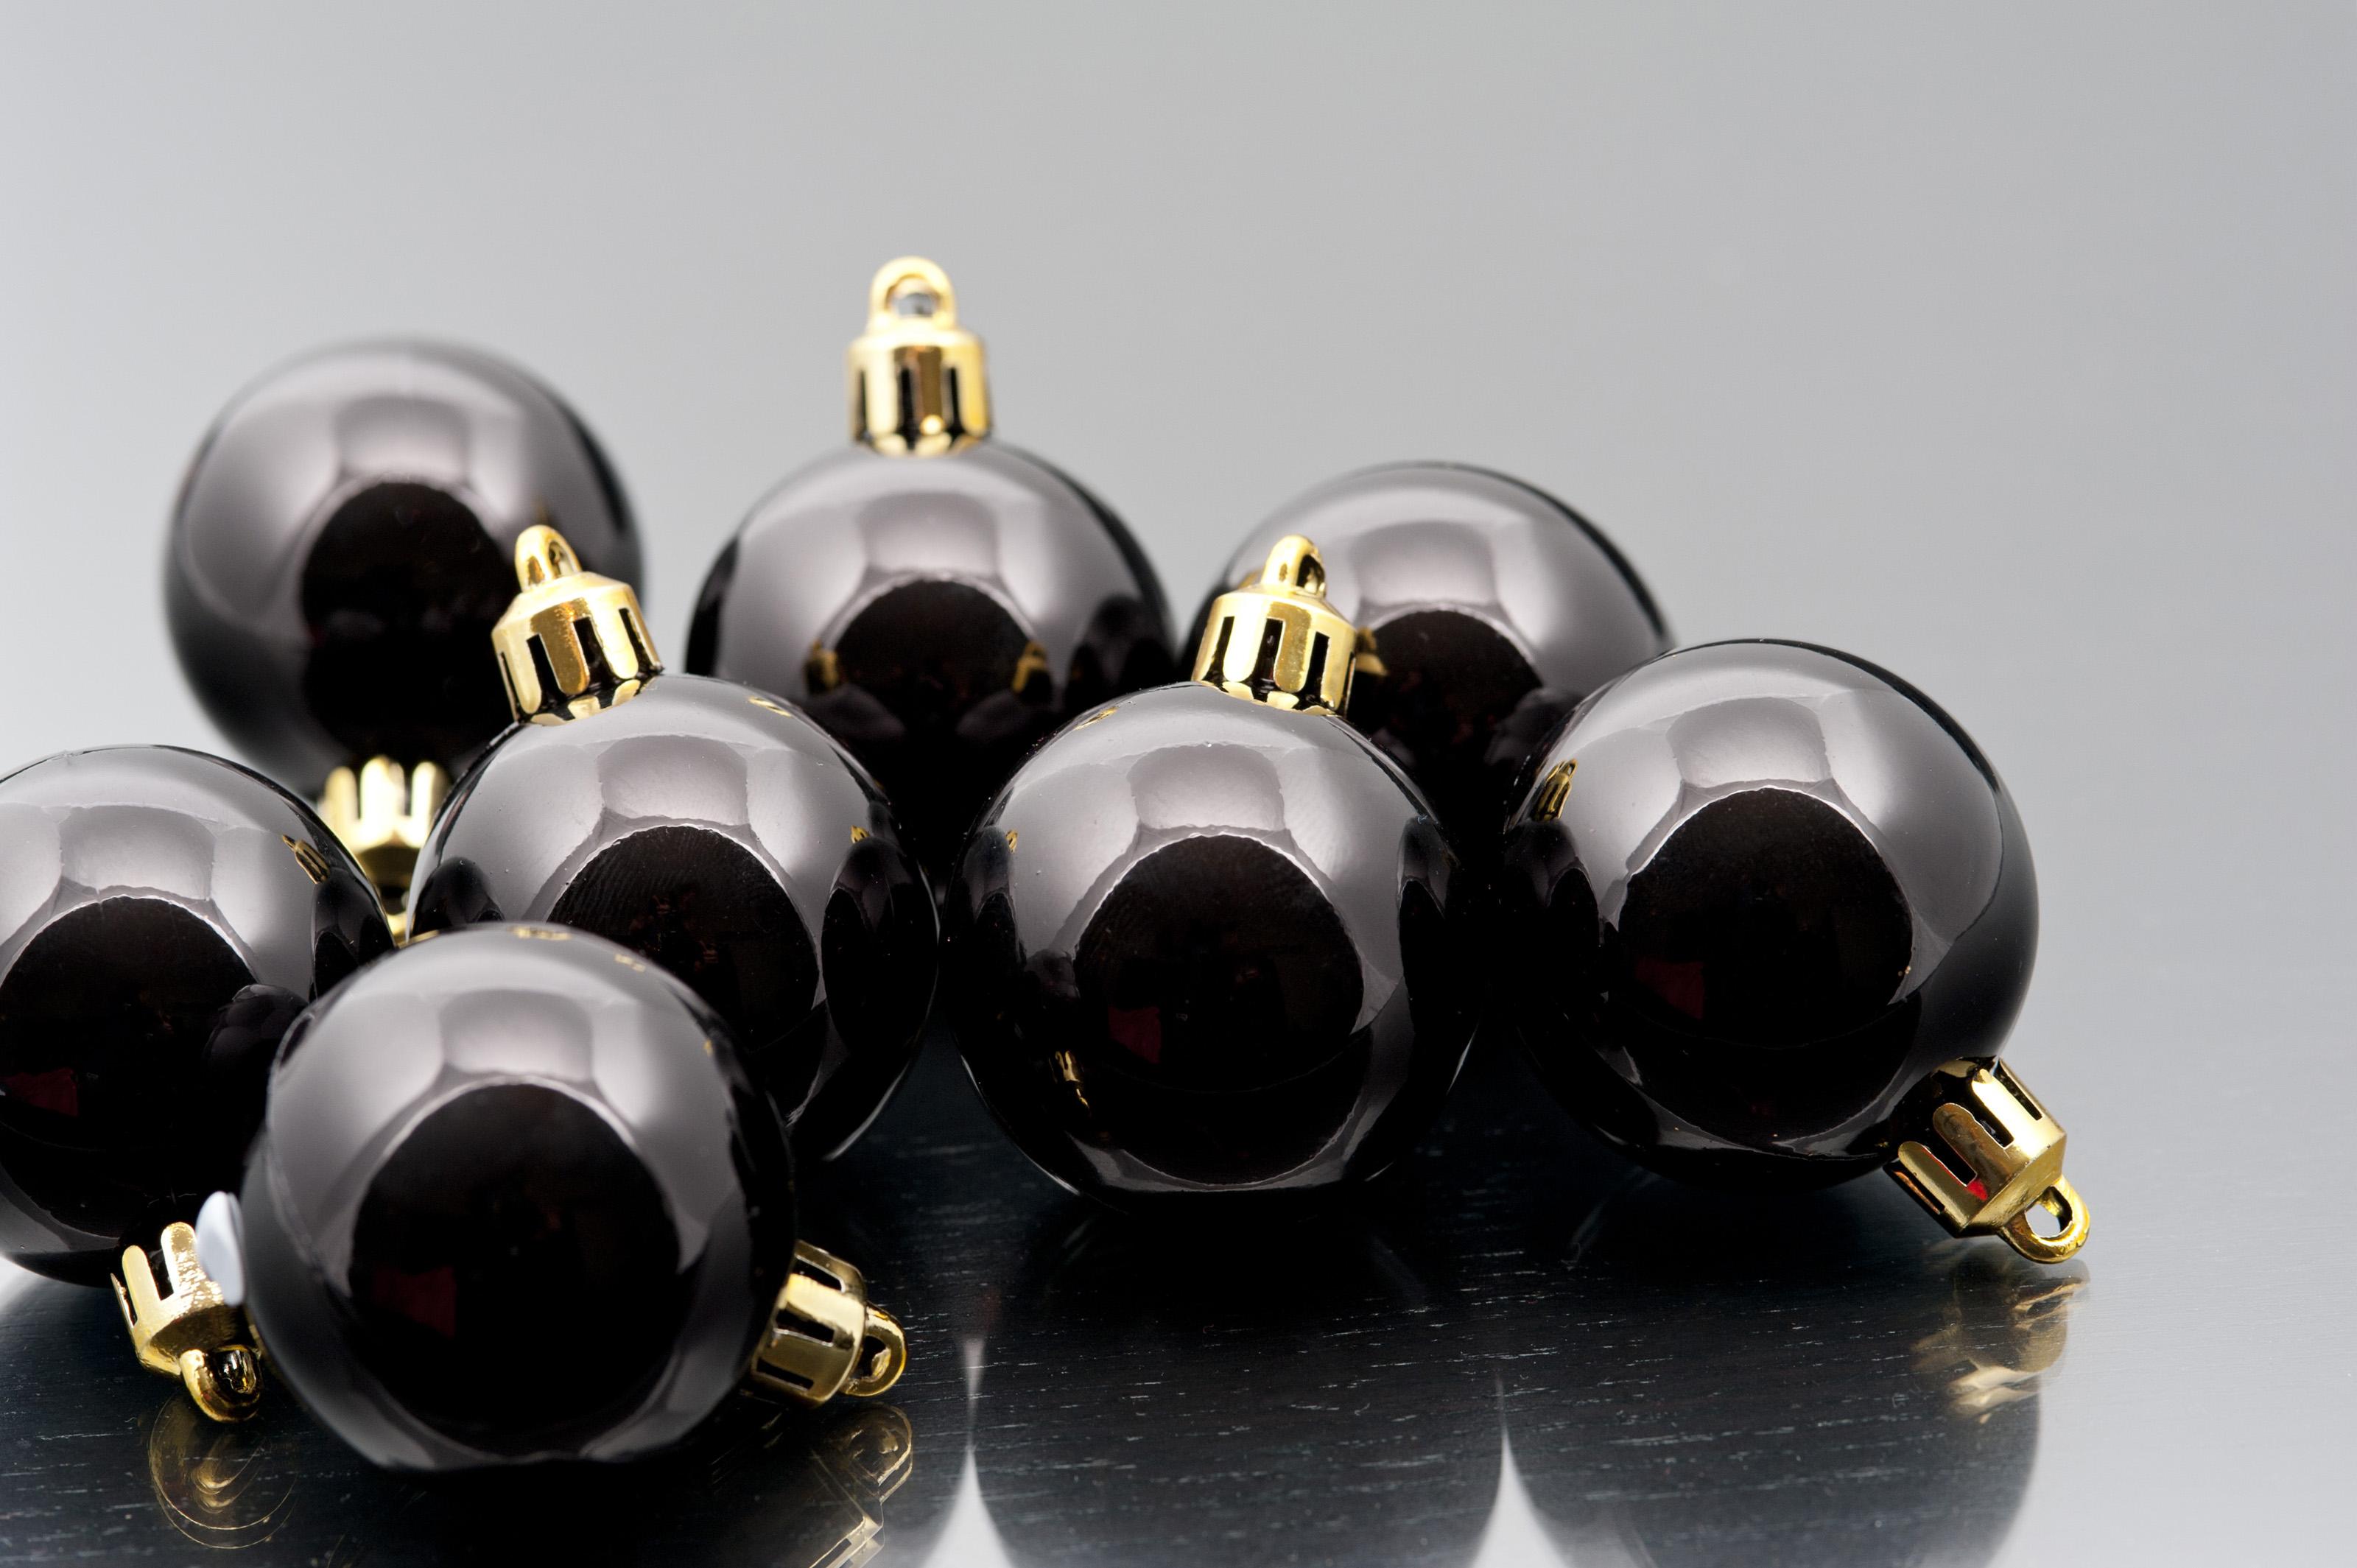 Black Christmas Balls.Free Stock Photo 6802 Collection Of Black Christmas Balls